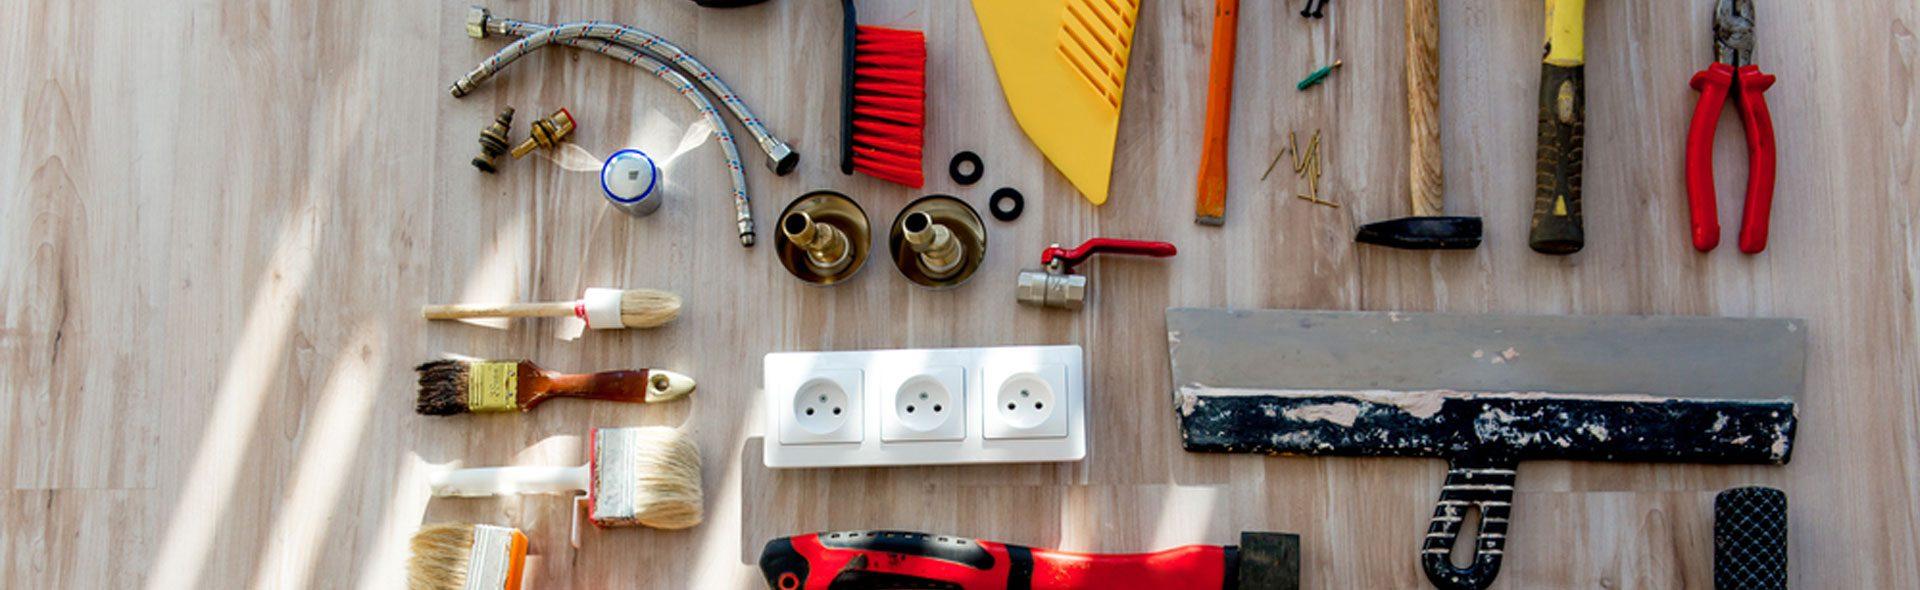 garage-tools